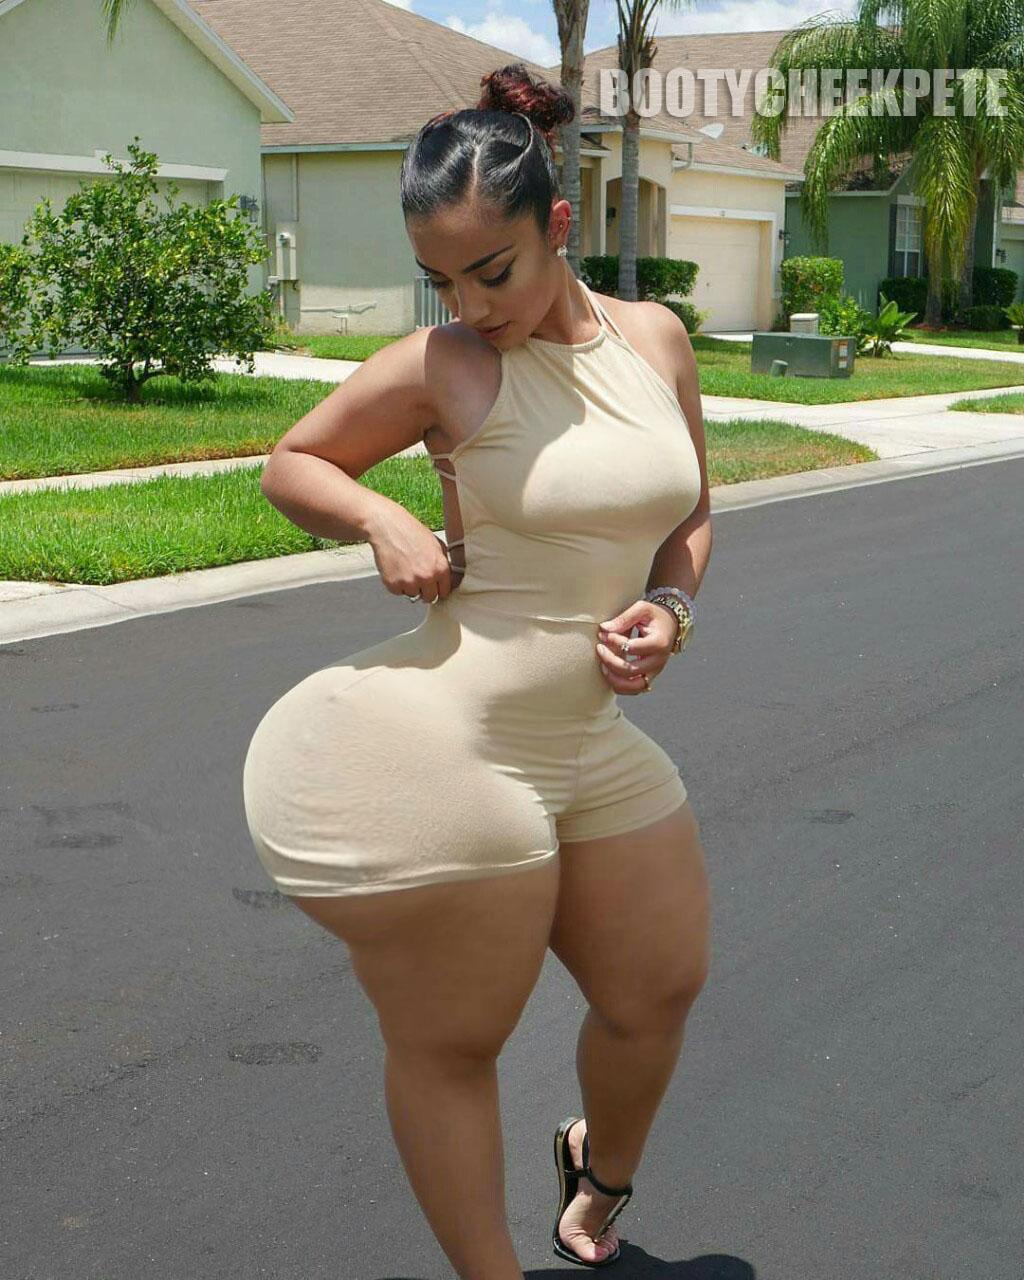 Big ass wobbly cheeks 4